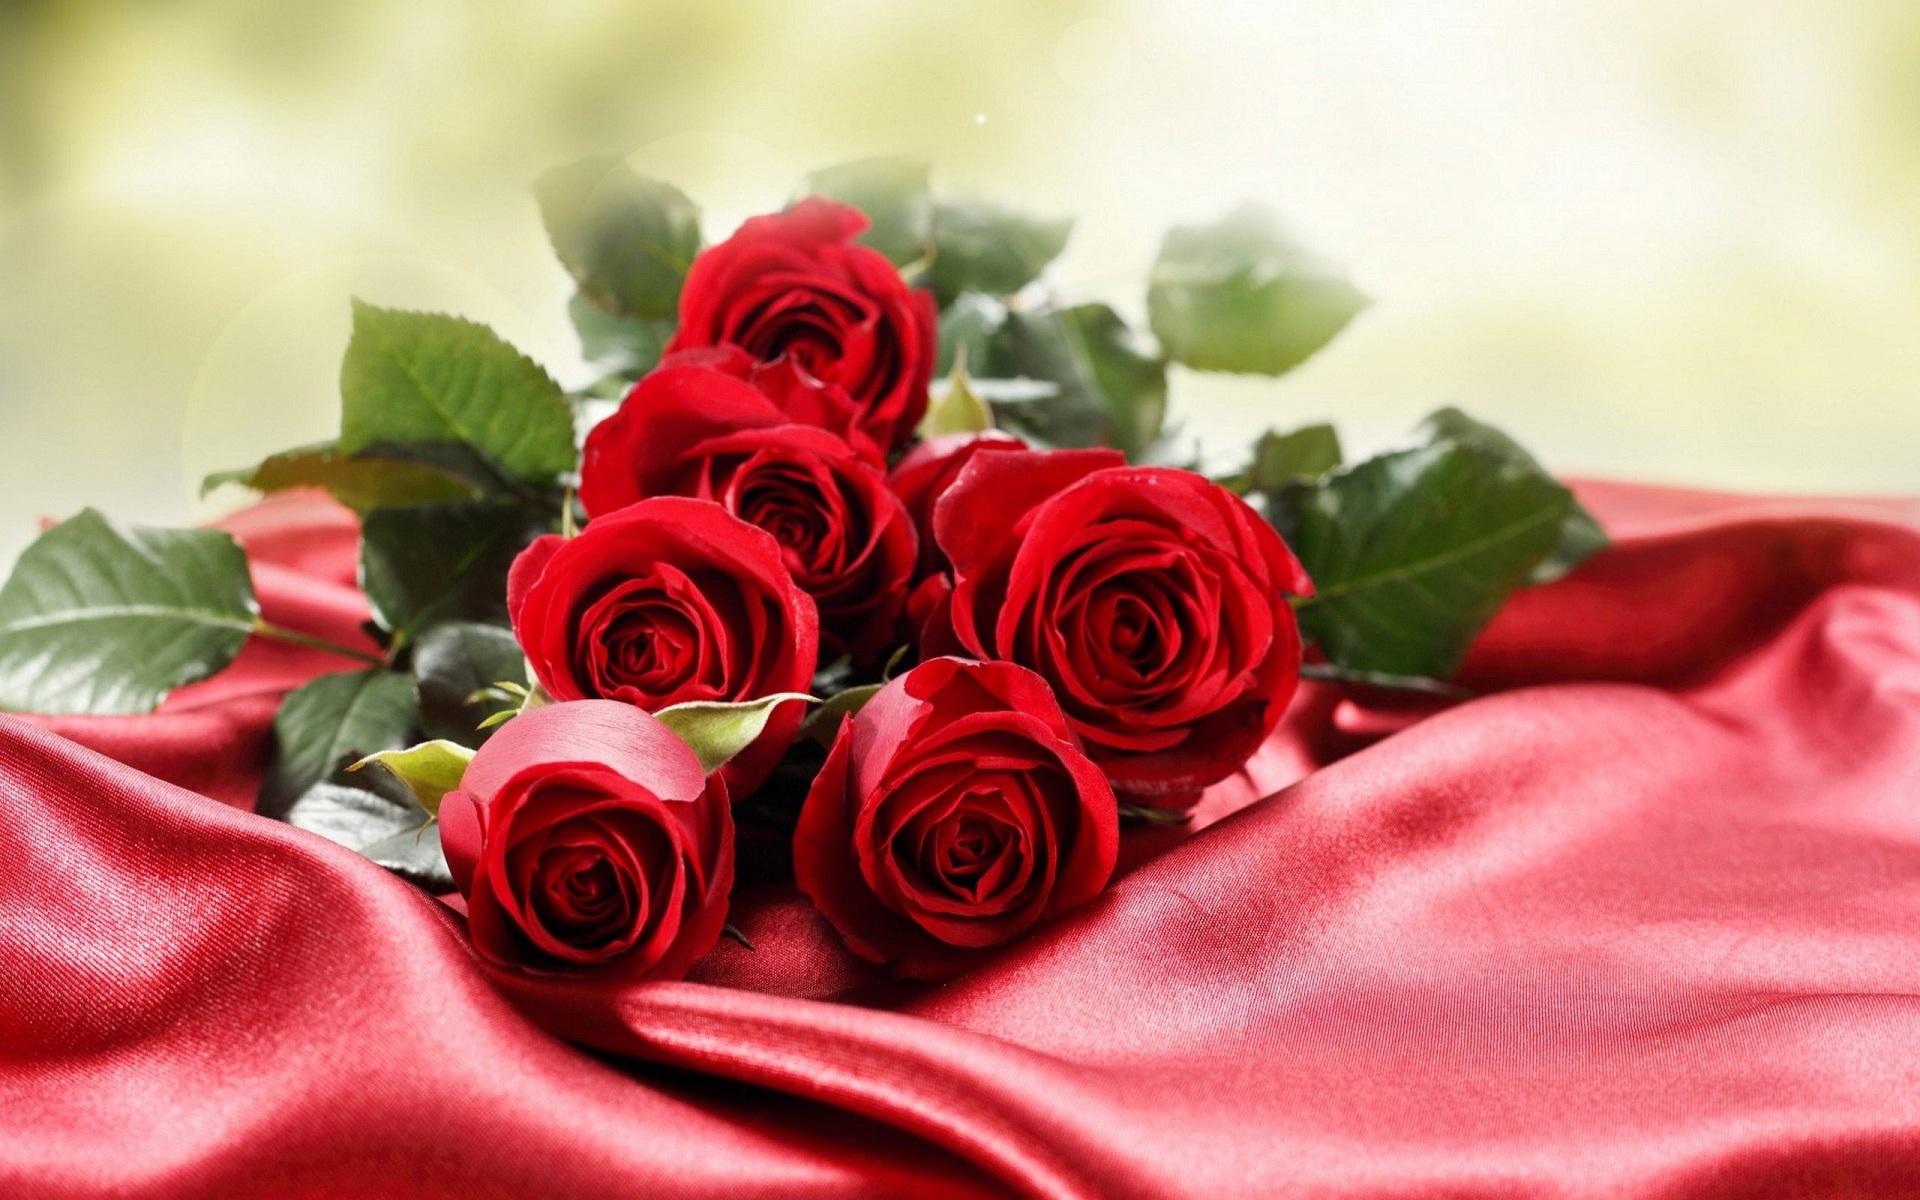 بالصور صور ورود جميلة , صور زهور جميله 3379 4